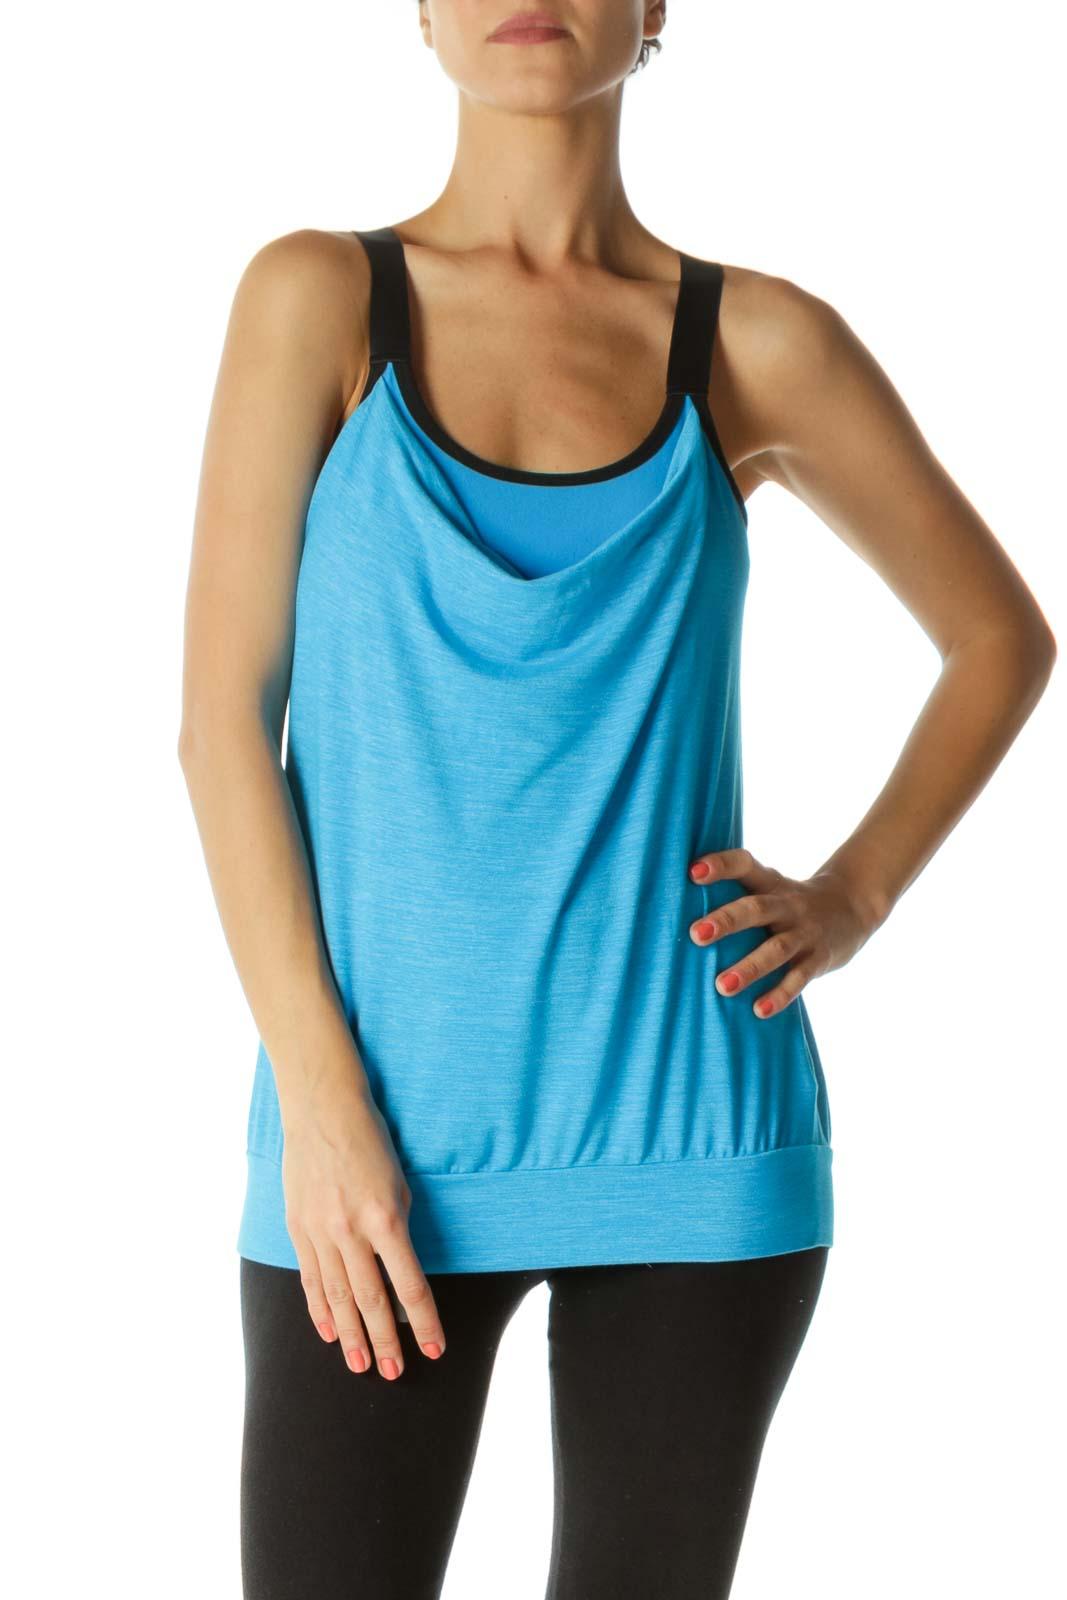 Blue Black Mottled Print Elastic Thick-Straps Crisscross Back Yoga Top Front